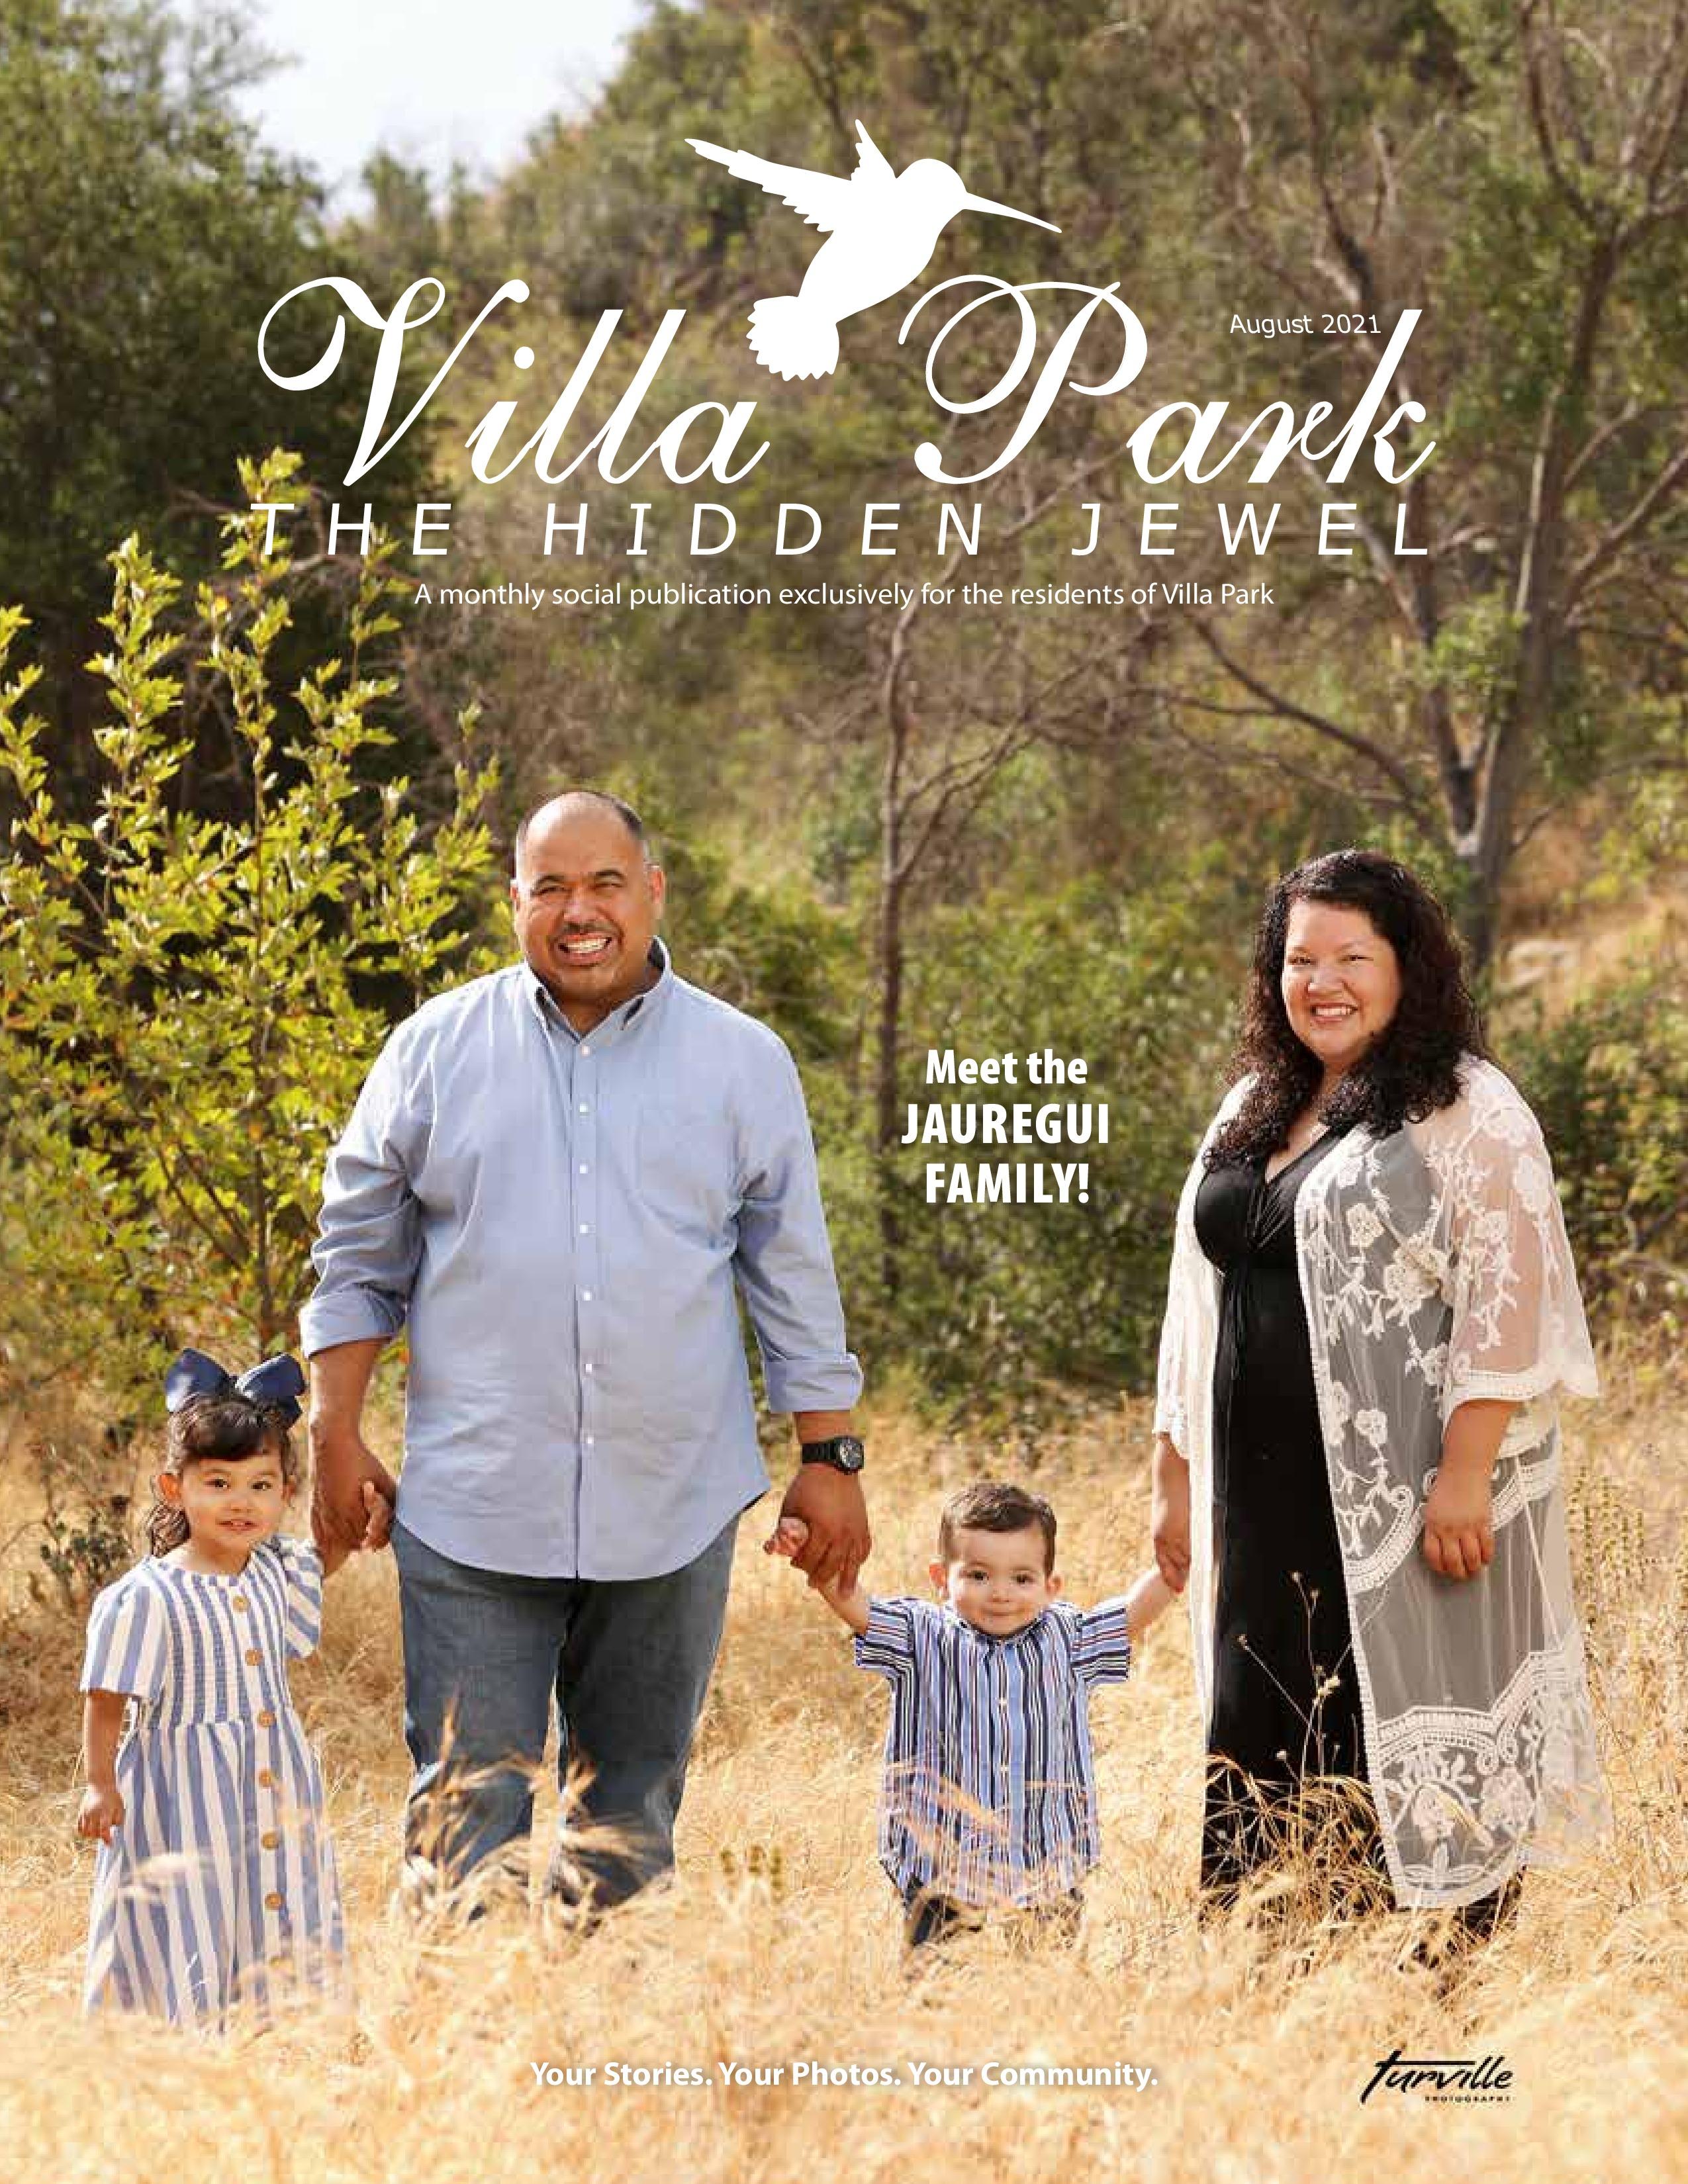 Villa Park The Hidden Jewel 2021-08-01